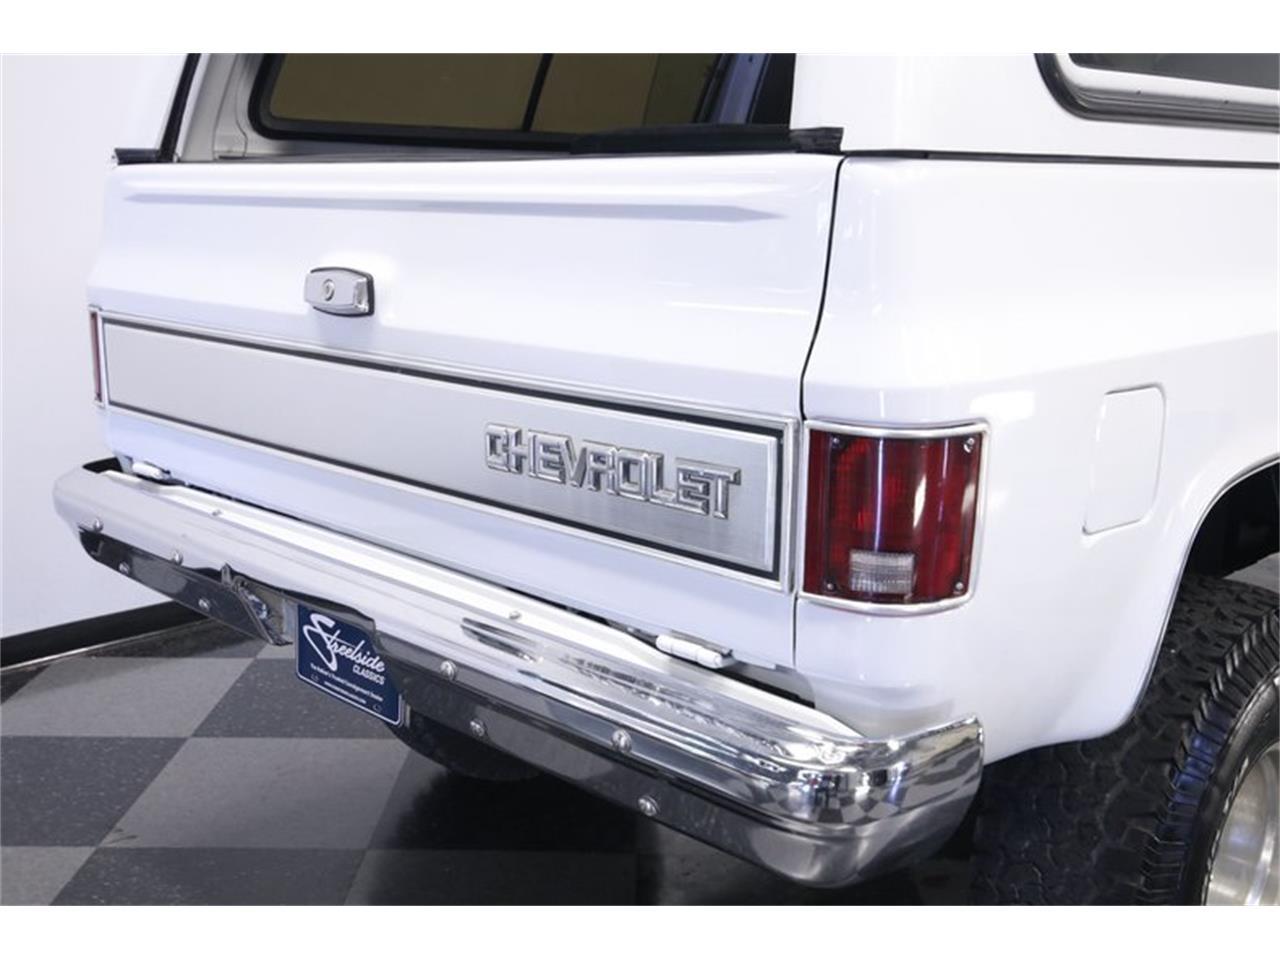 1986 Chevrolet Blazer (CC-1334056) for sale in Lutz, Florida